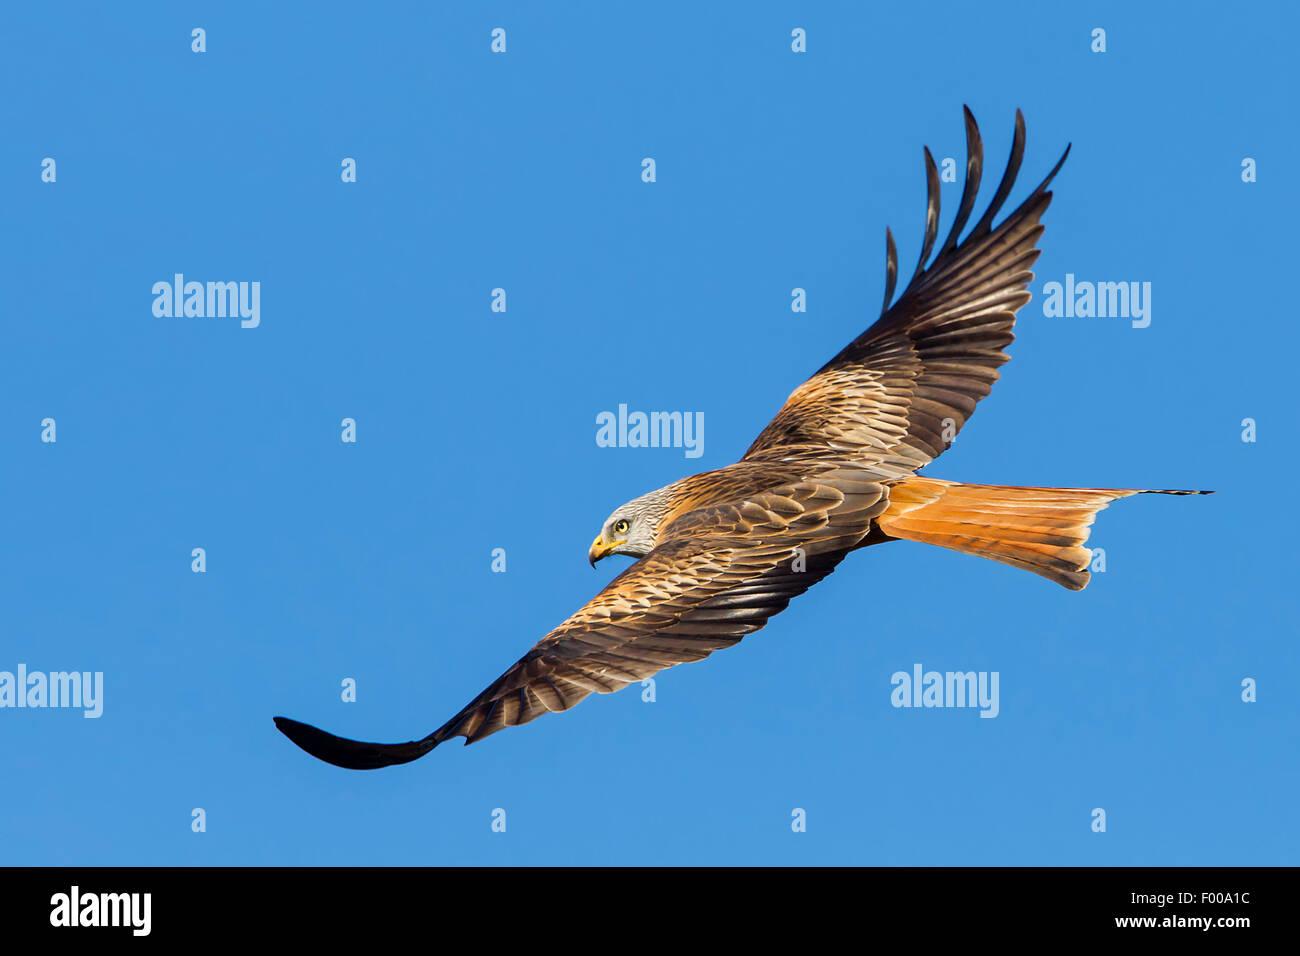 Nibbio reale (Milvus milvus), in volo, vista laterale, Svizzera Vallese Foto Stock